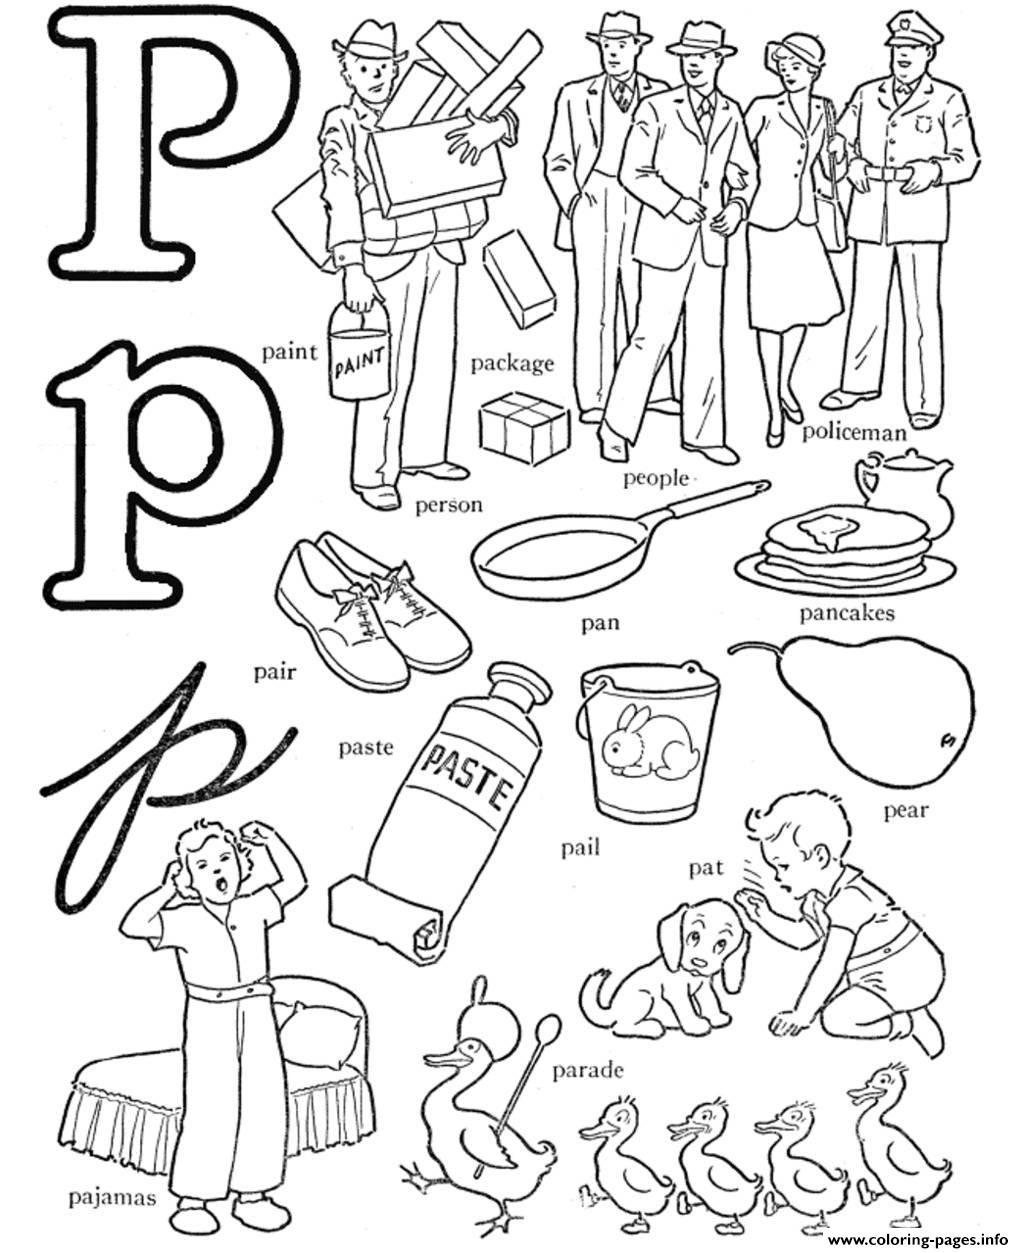 Letter P Activities  Kidzone Educational Worksheets!